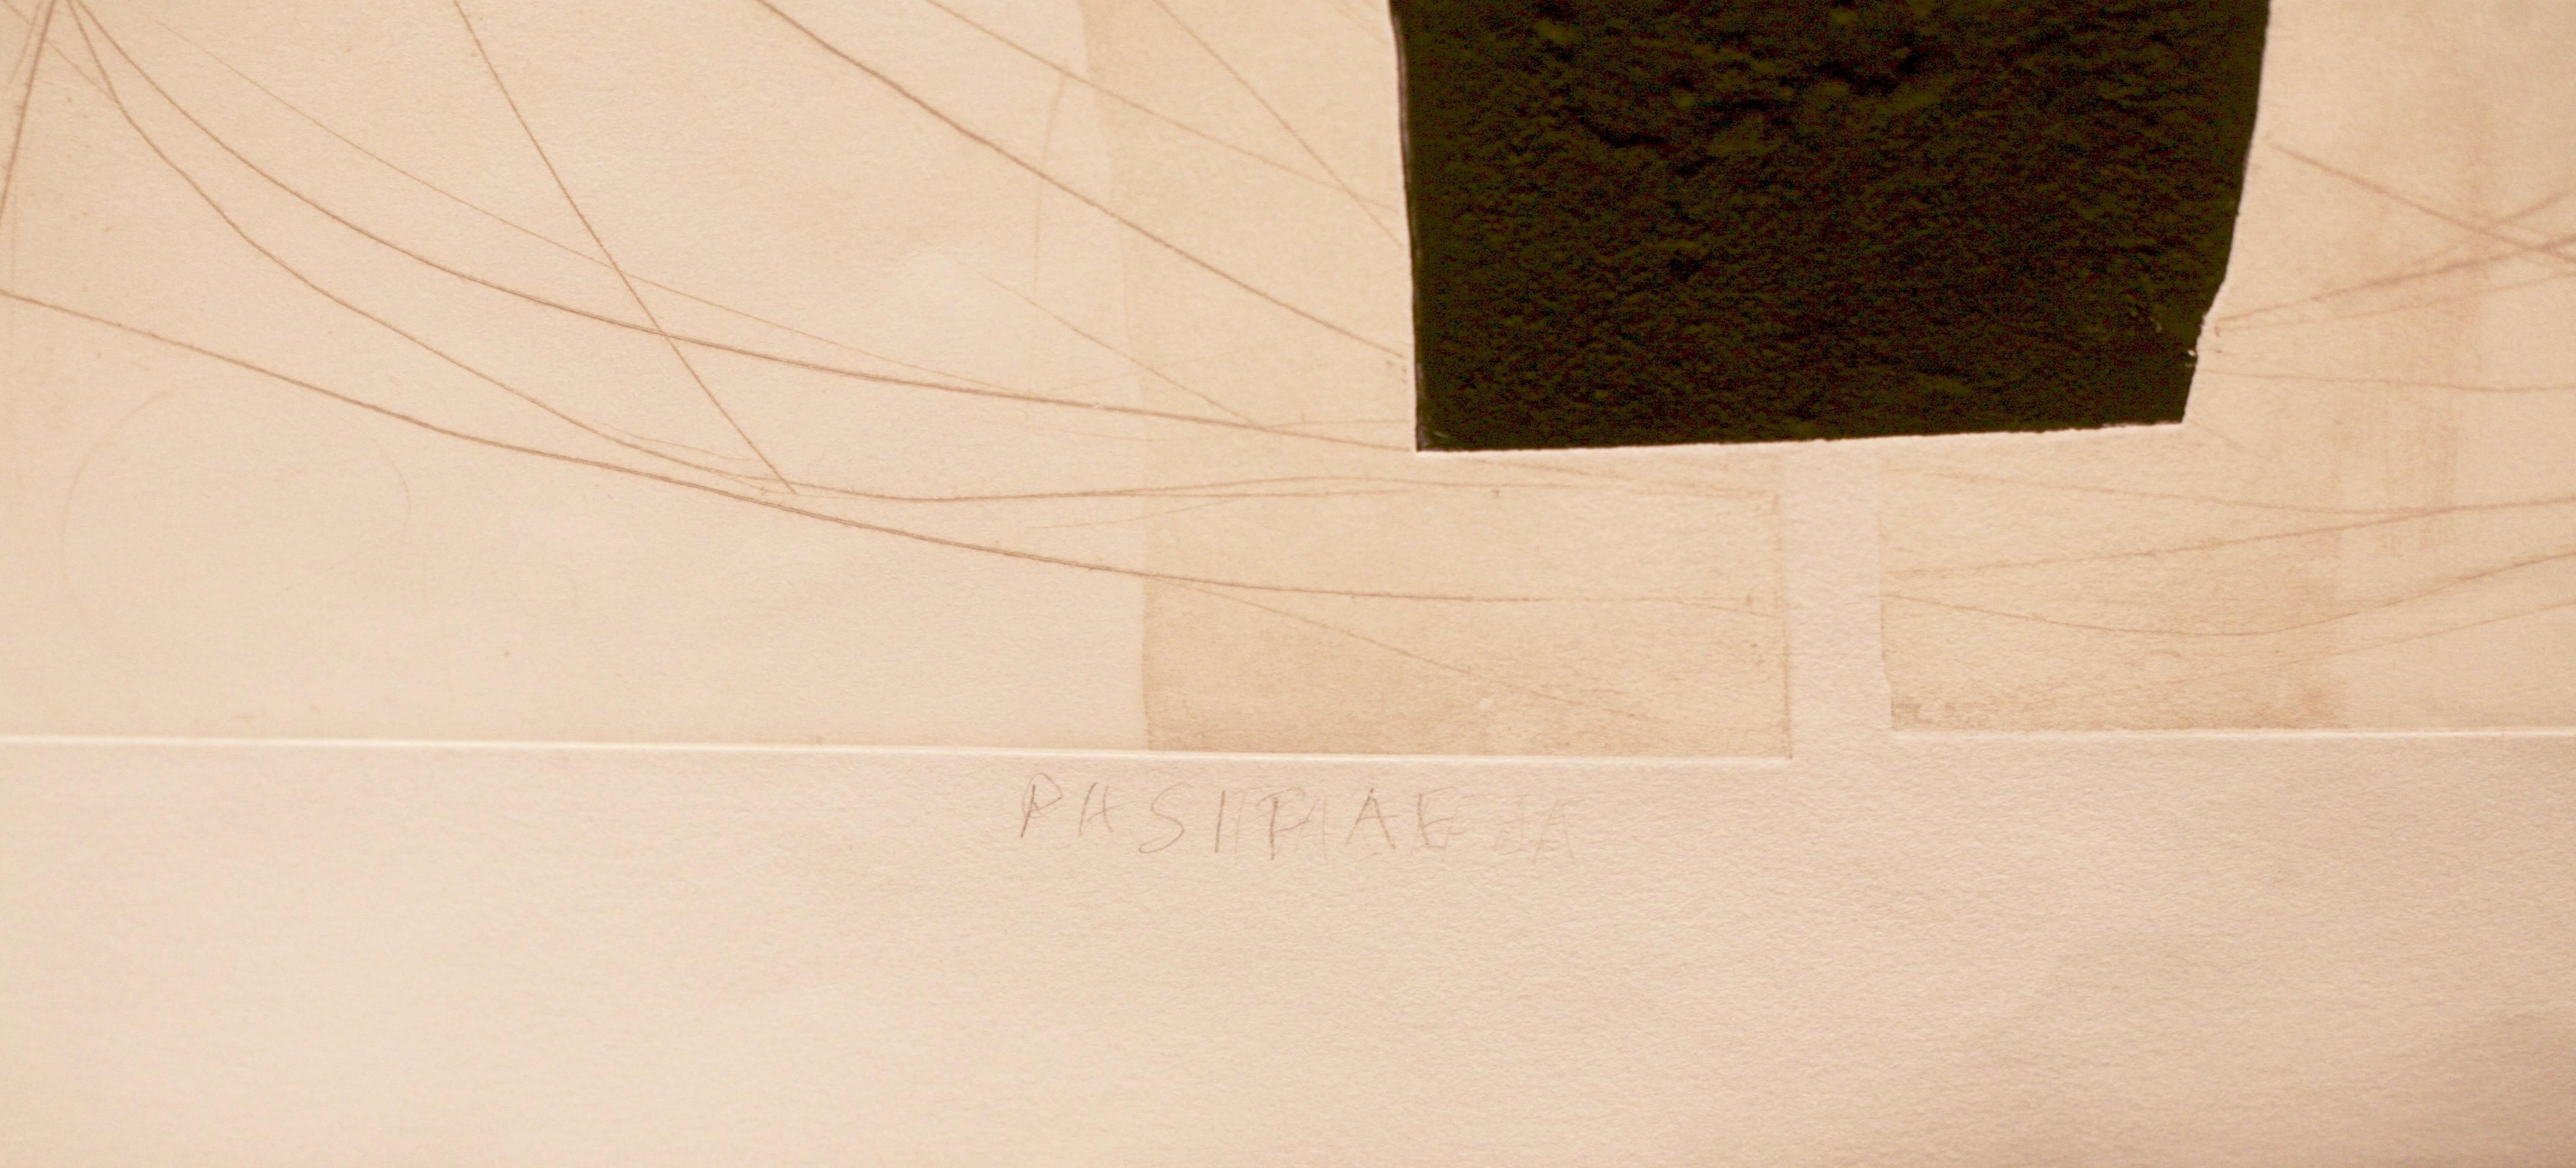 Angela Brignone Duckert, Parsifae, graphic print